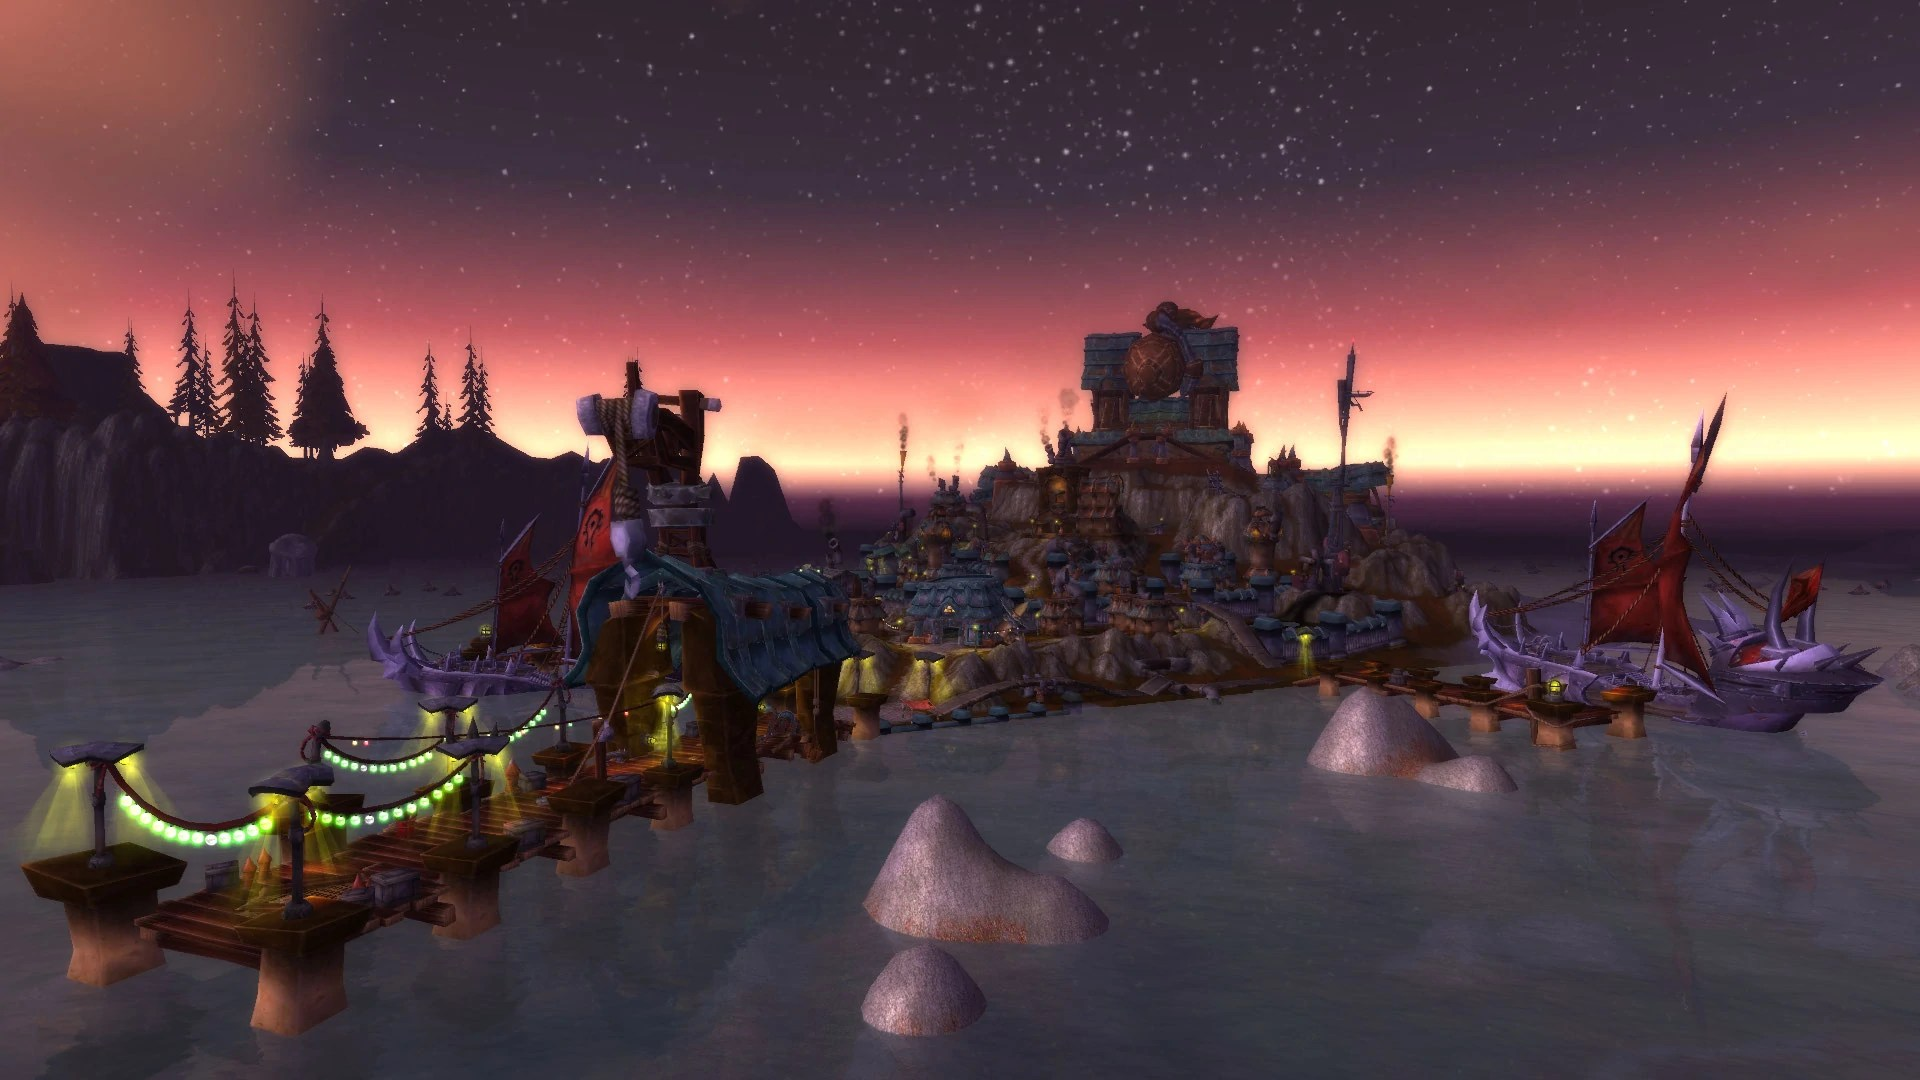 World Of Warcraft Wallpapers Hd Bilgewater Harbor Wowwiki Fandom Powered By Wikia